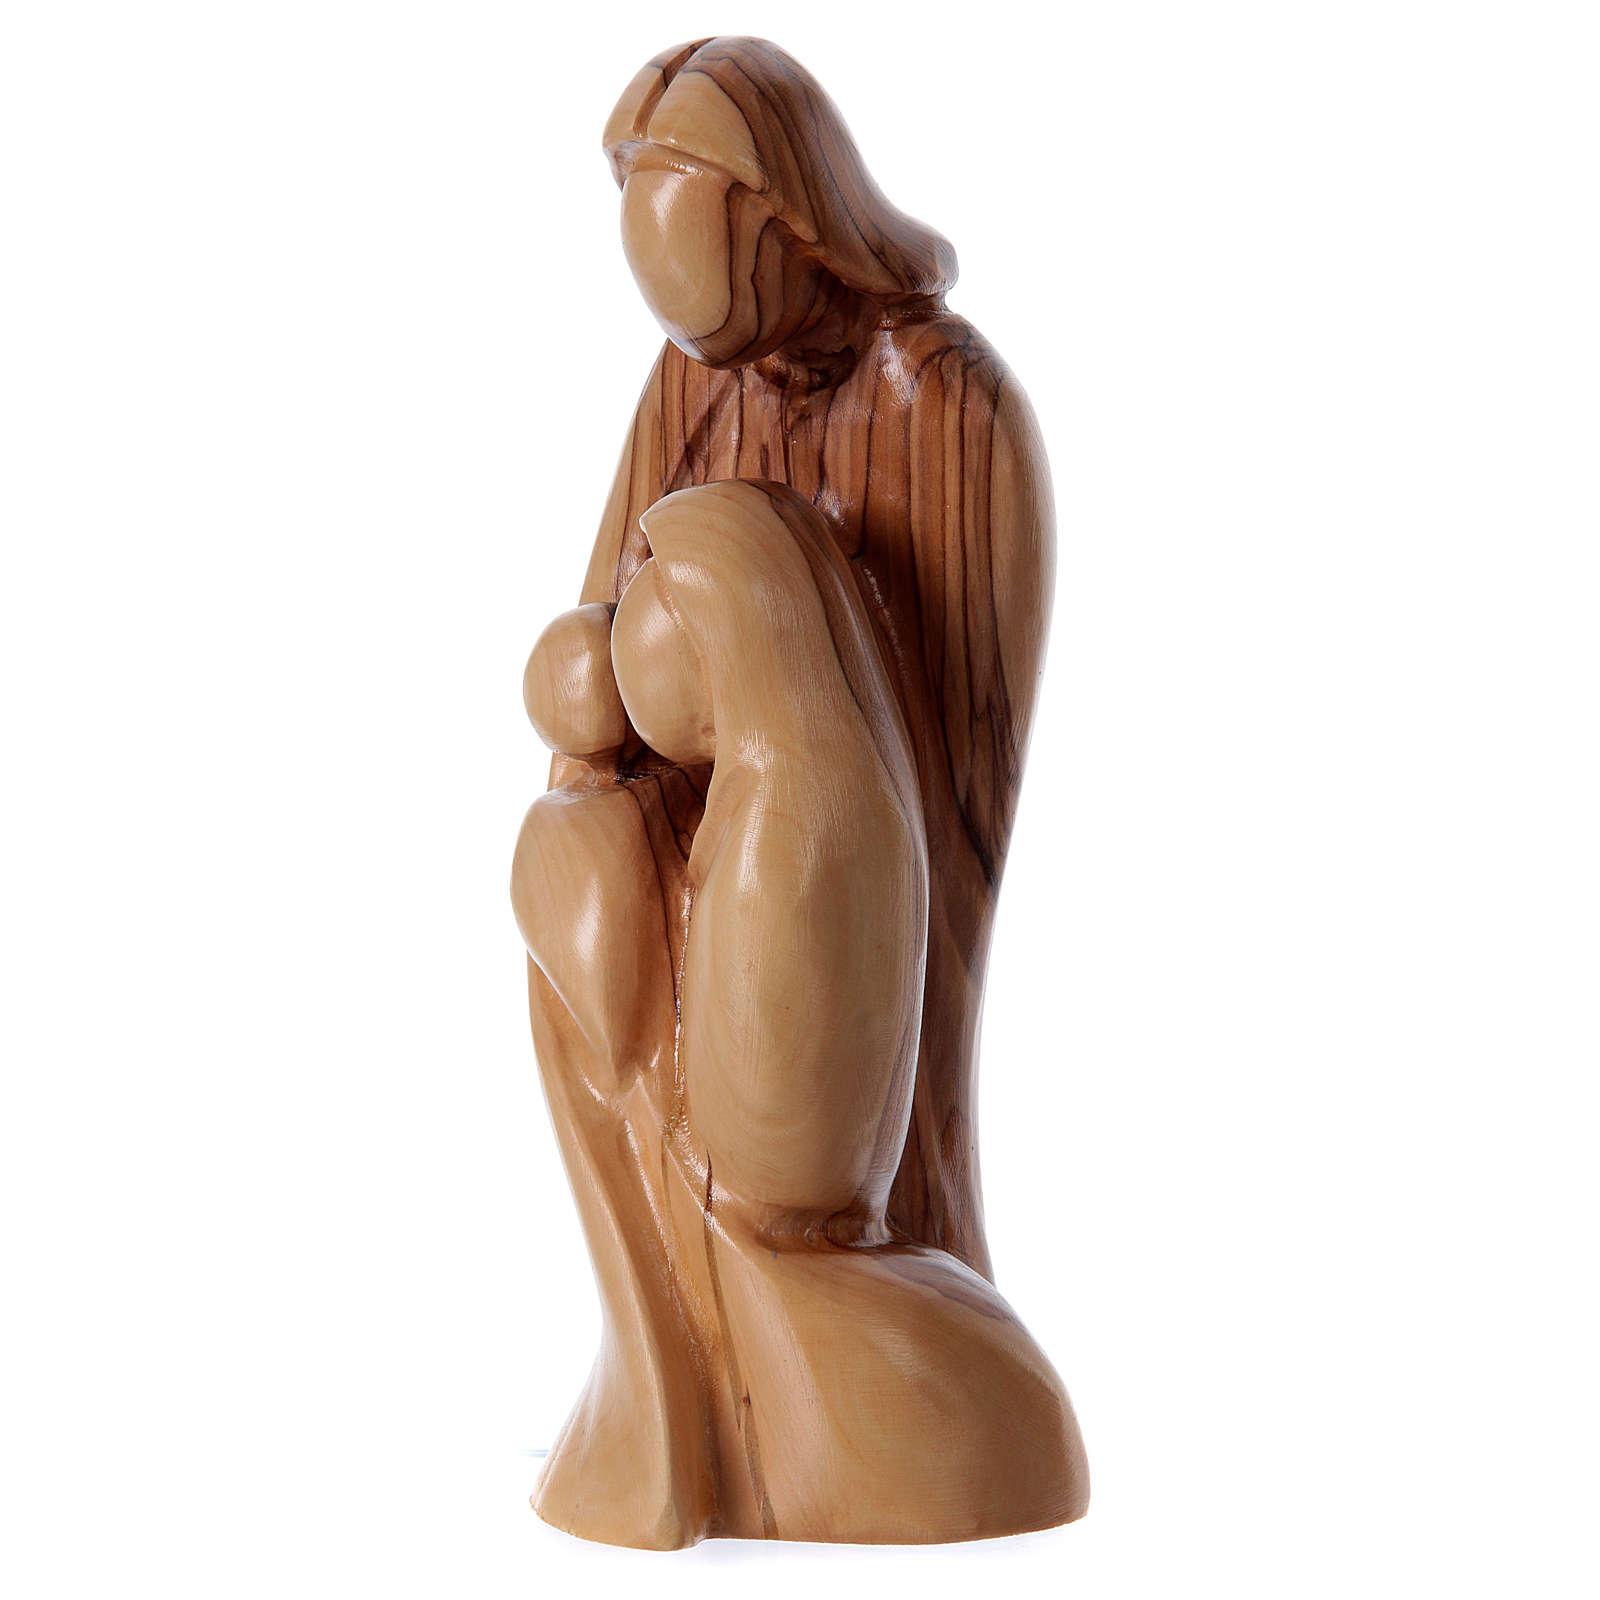 Estatua Sagrada Familia estilizada Olivo de Belén 20 cm 4